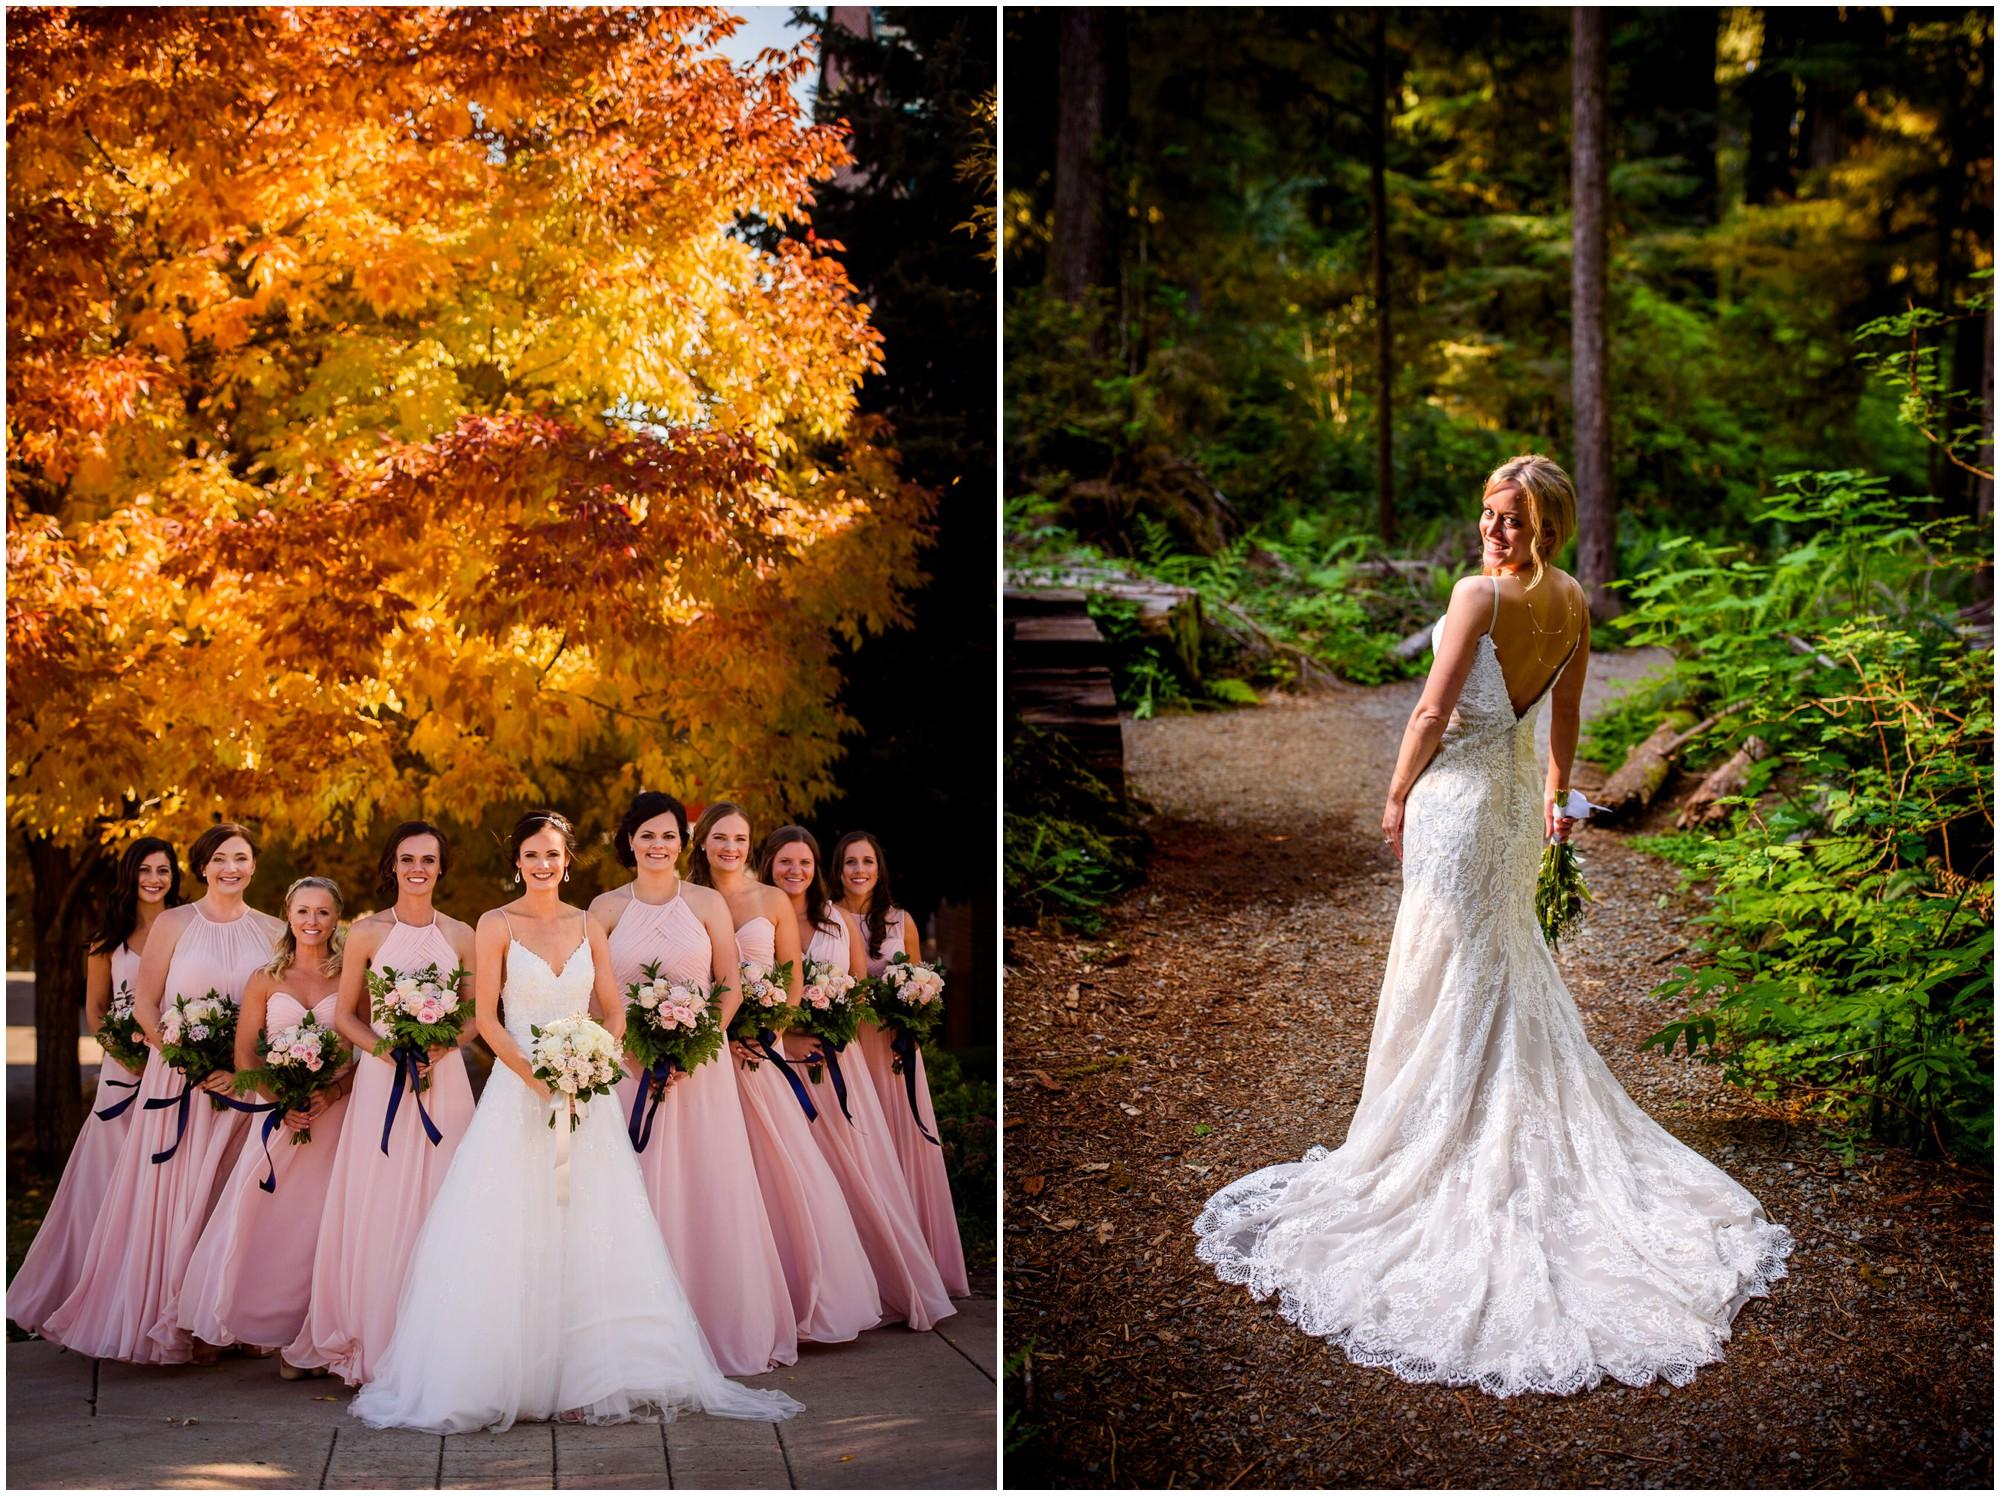 630-Boulder-Colorado-Fall-wedding-photography-king.jpg